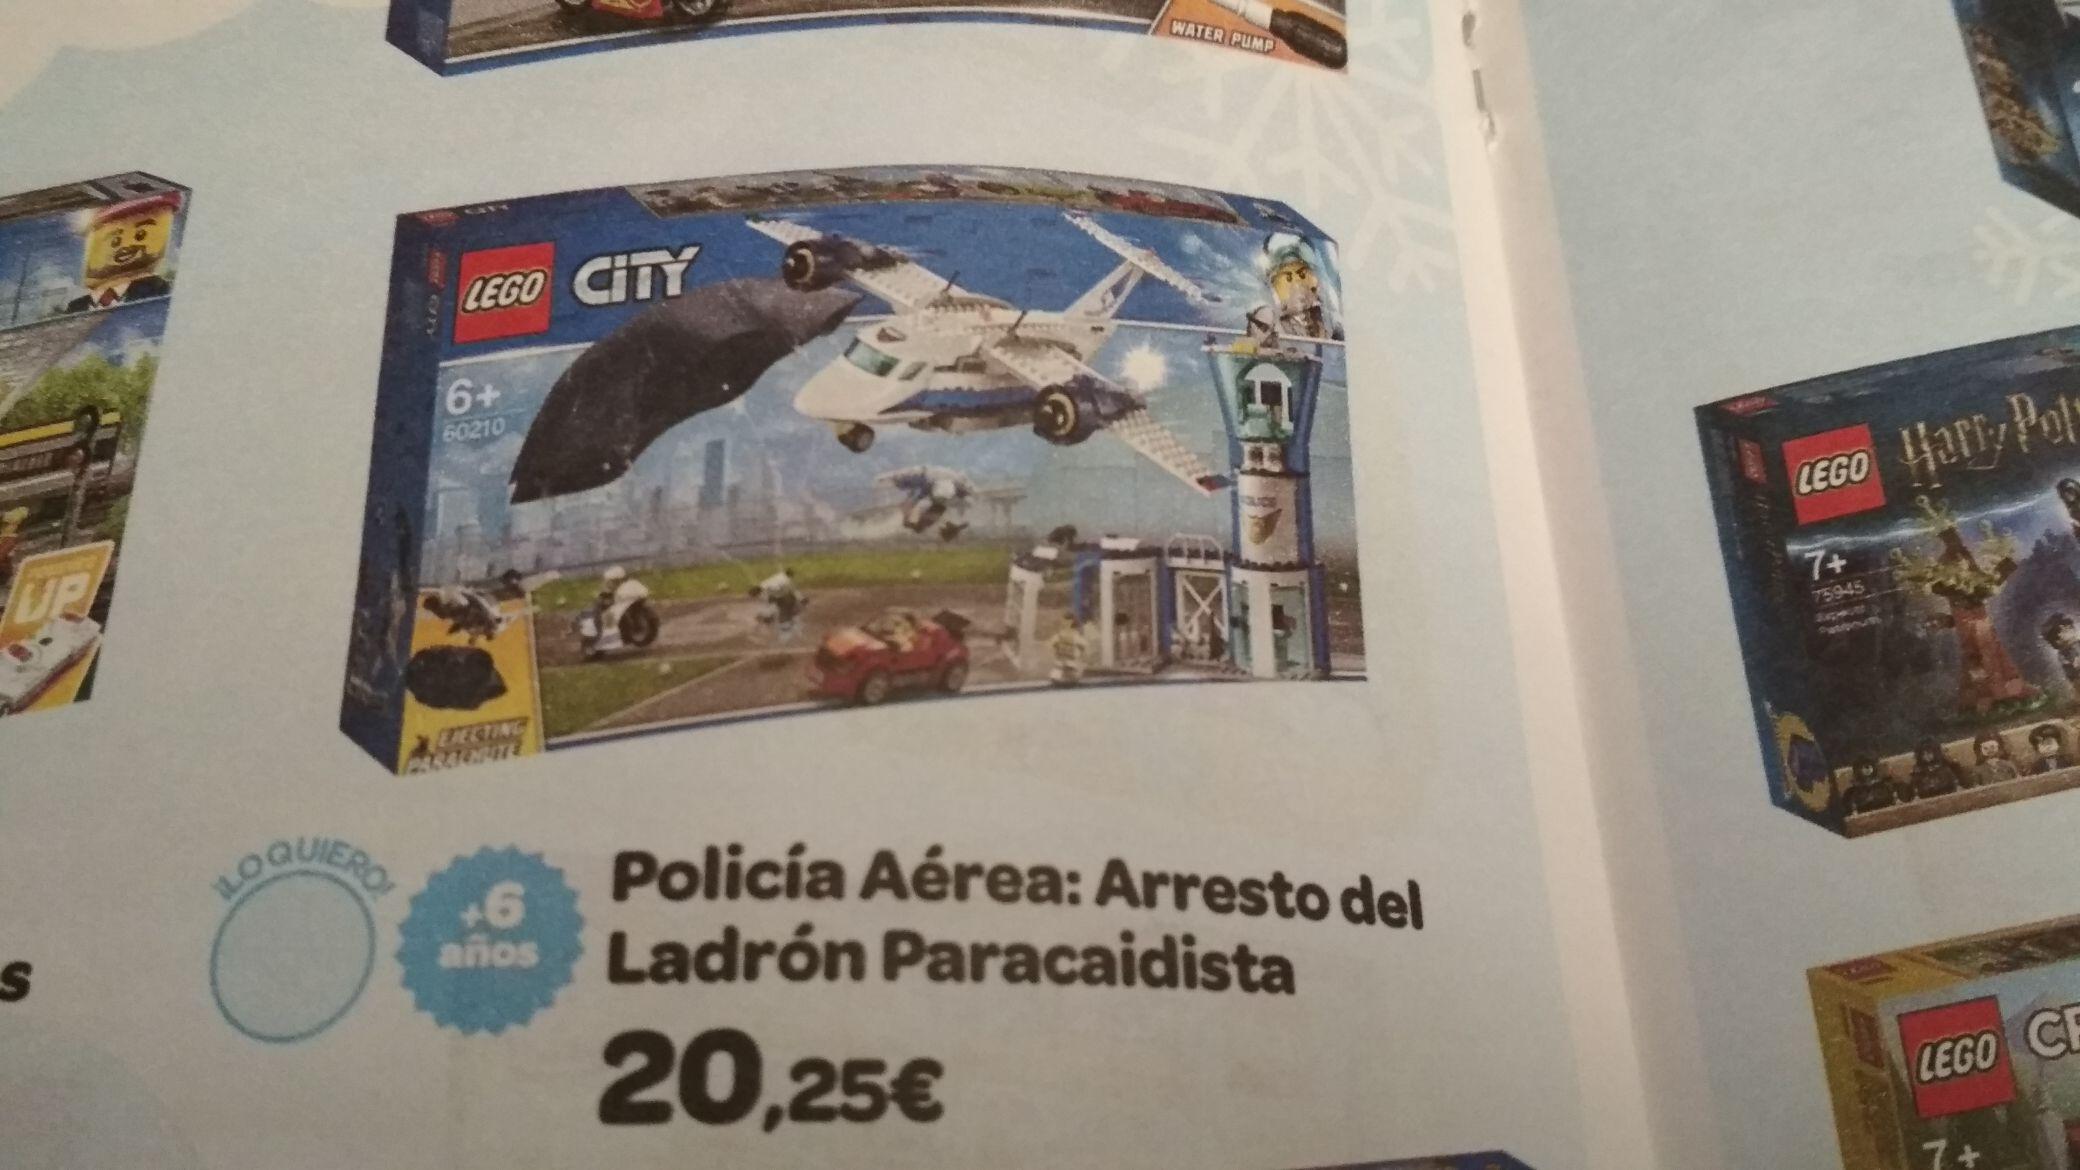 Lego Policía Aérea. Base de operaciones (Catalogo carrefour)